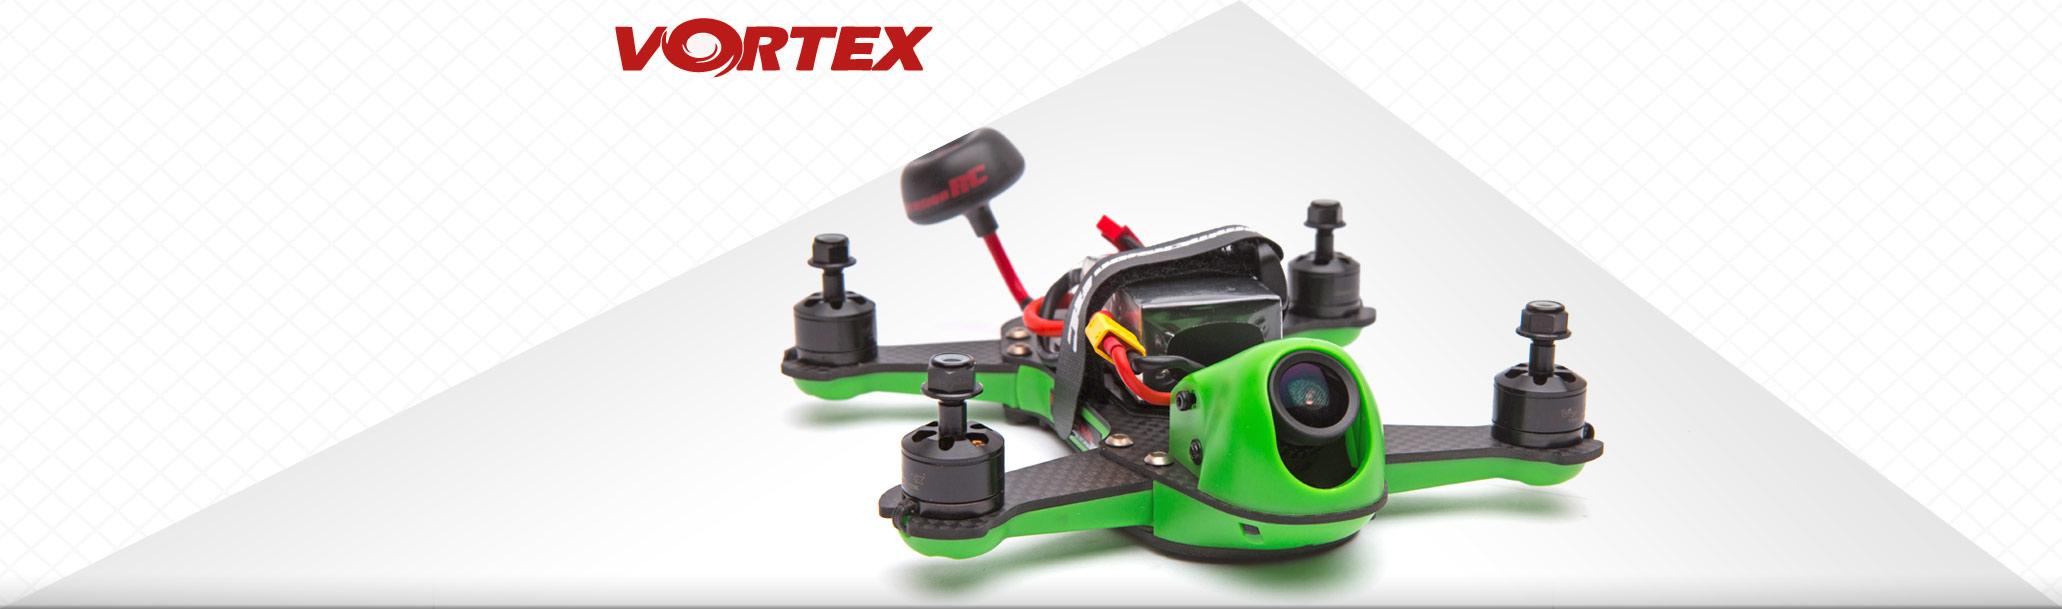 Blade Vortex 150 BNF FPV Racer 25mW with OSD - BLH9550EU